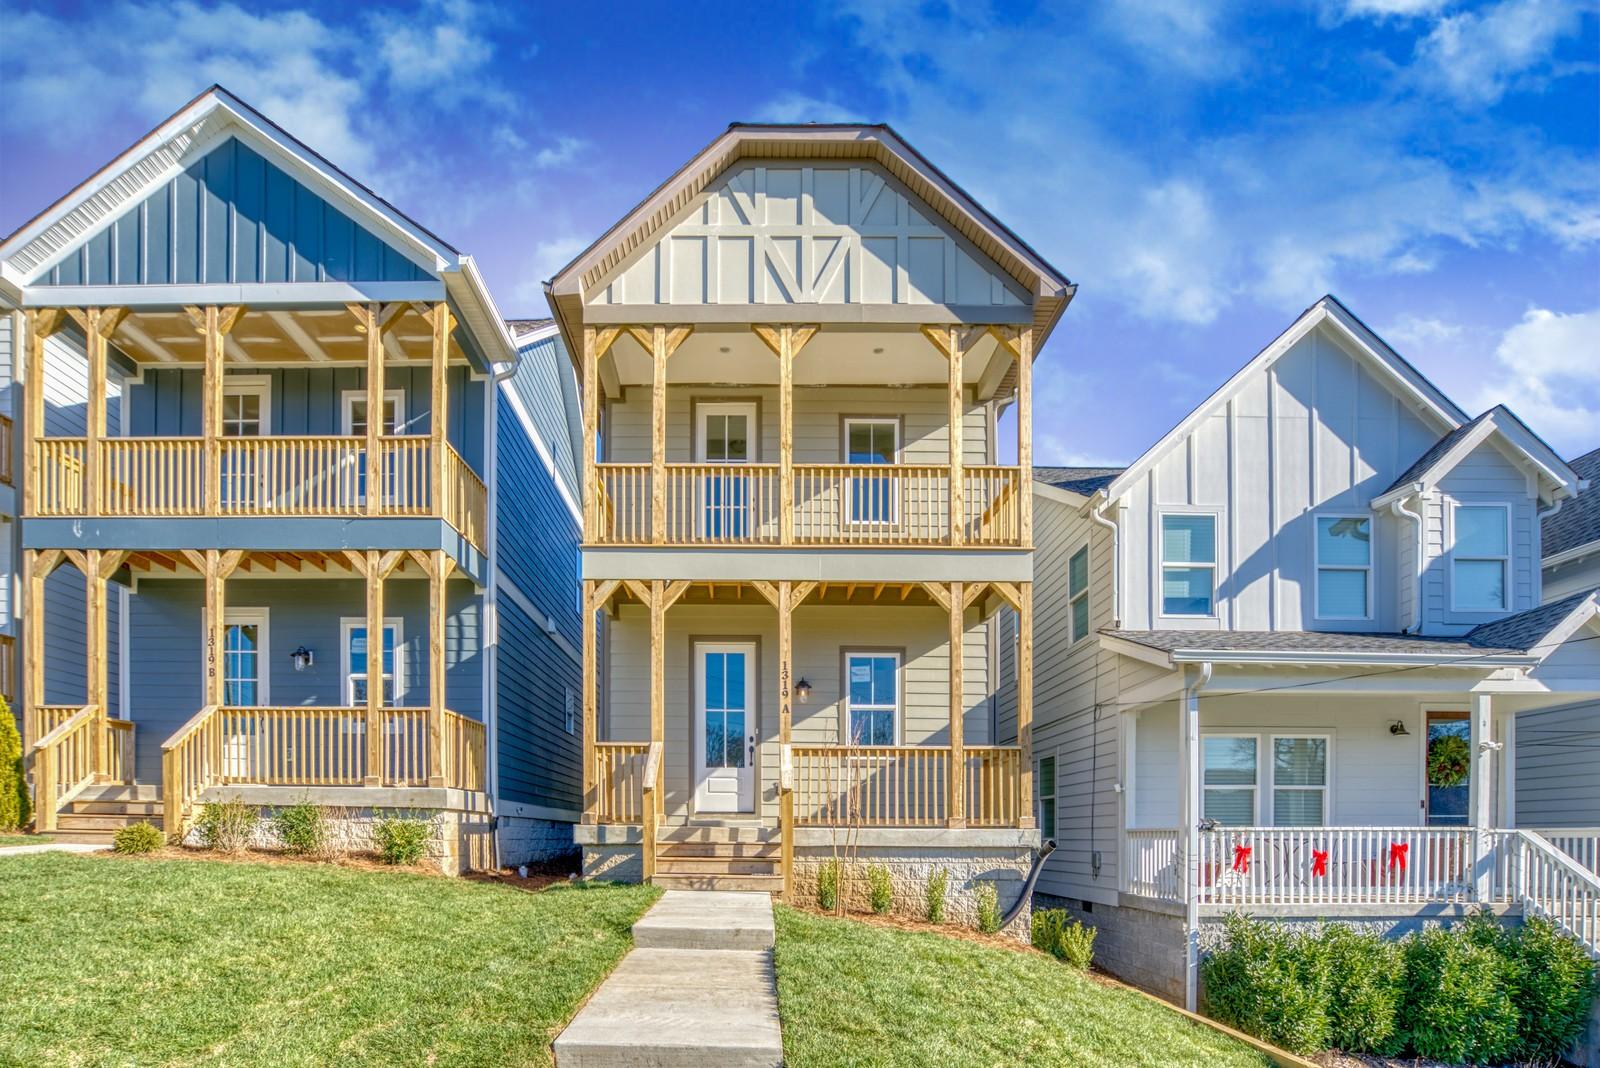 1319 Meridian St, Nashville, TN 37207 - Nashville, TN real estate listing